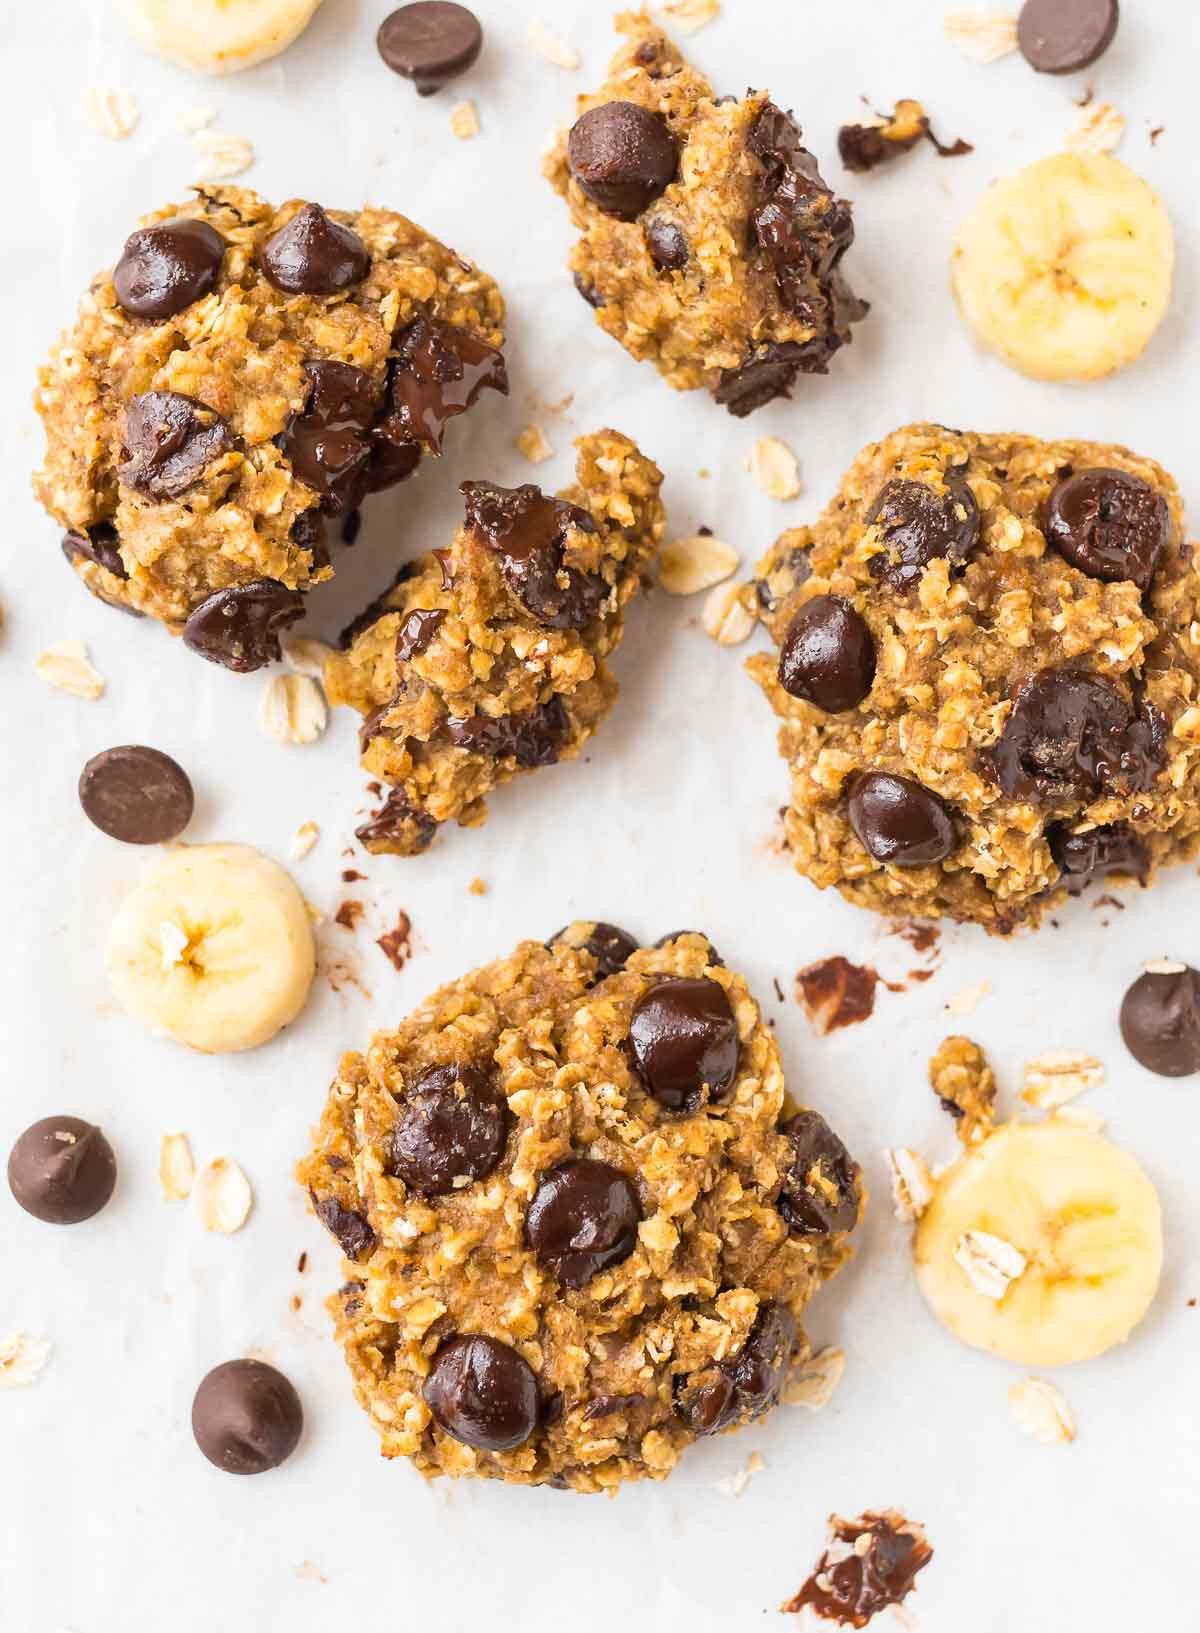 Healthy Oatmeal Banana Cookies  Healthy Banana Oatmeal Cookies with Chocolate Chips